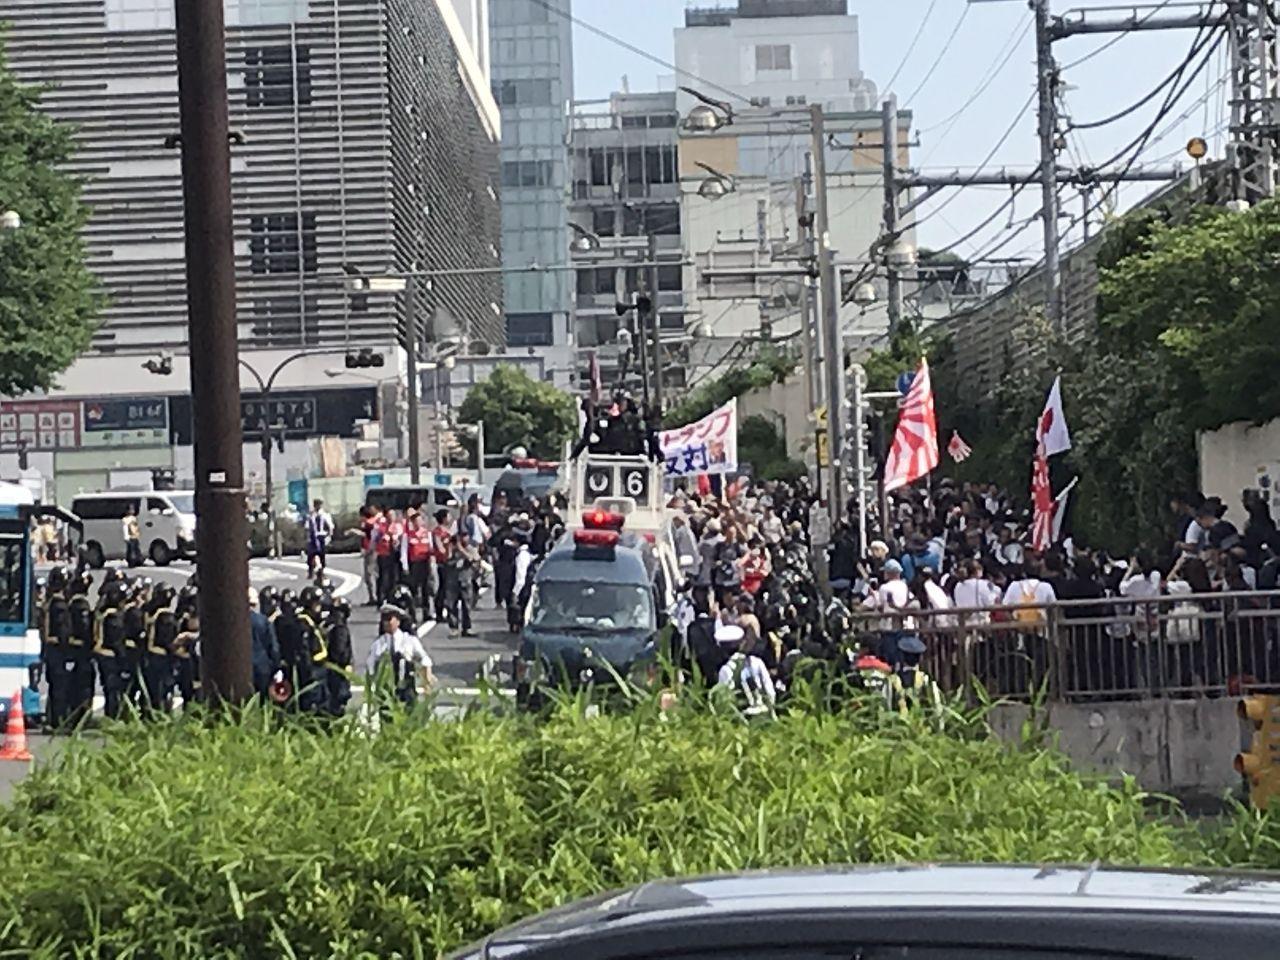 ^DJI - NYダウ > 多分トランプに対してアンチの目立った運動が無いのはアメリカも含めて世界中に日本ぐらいだろう